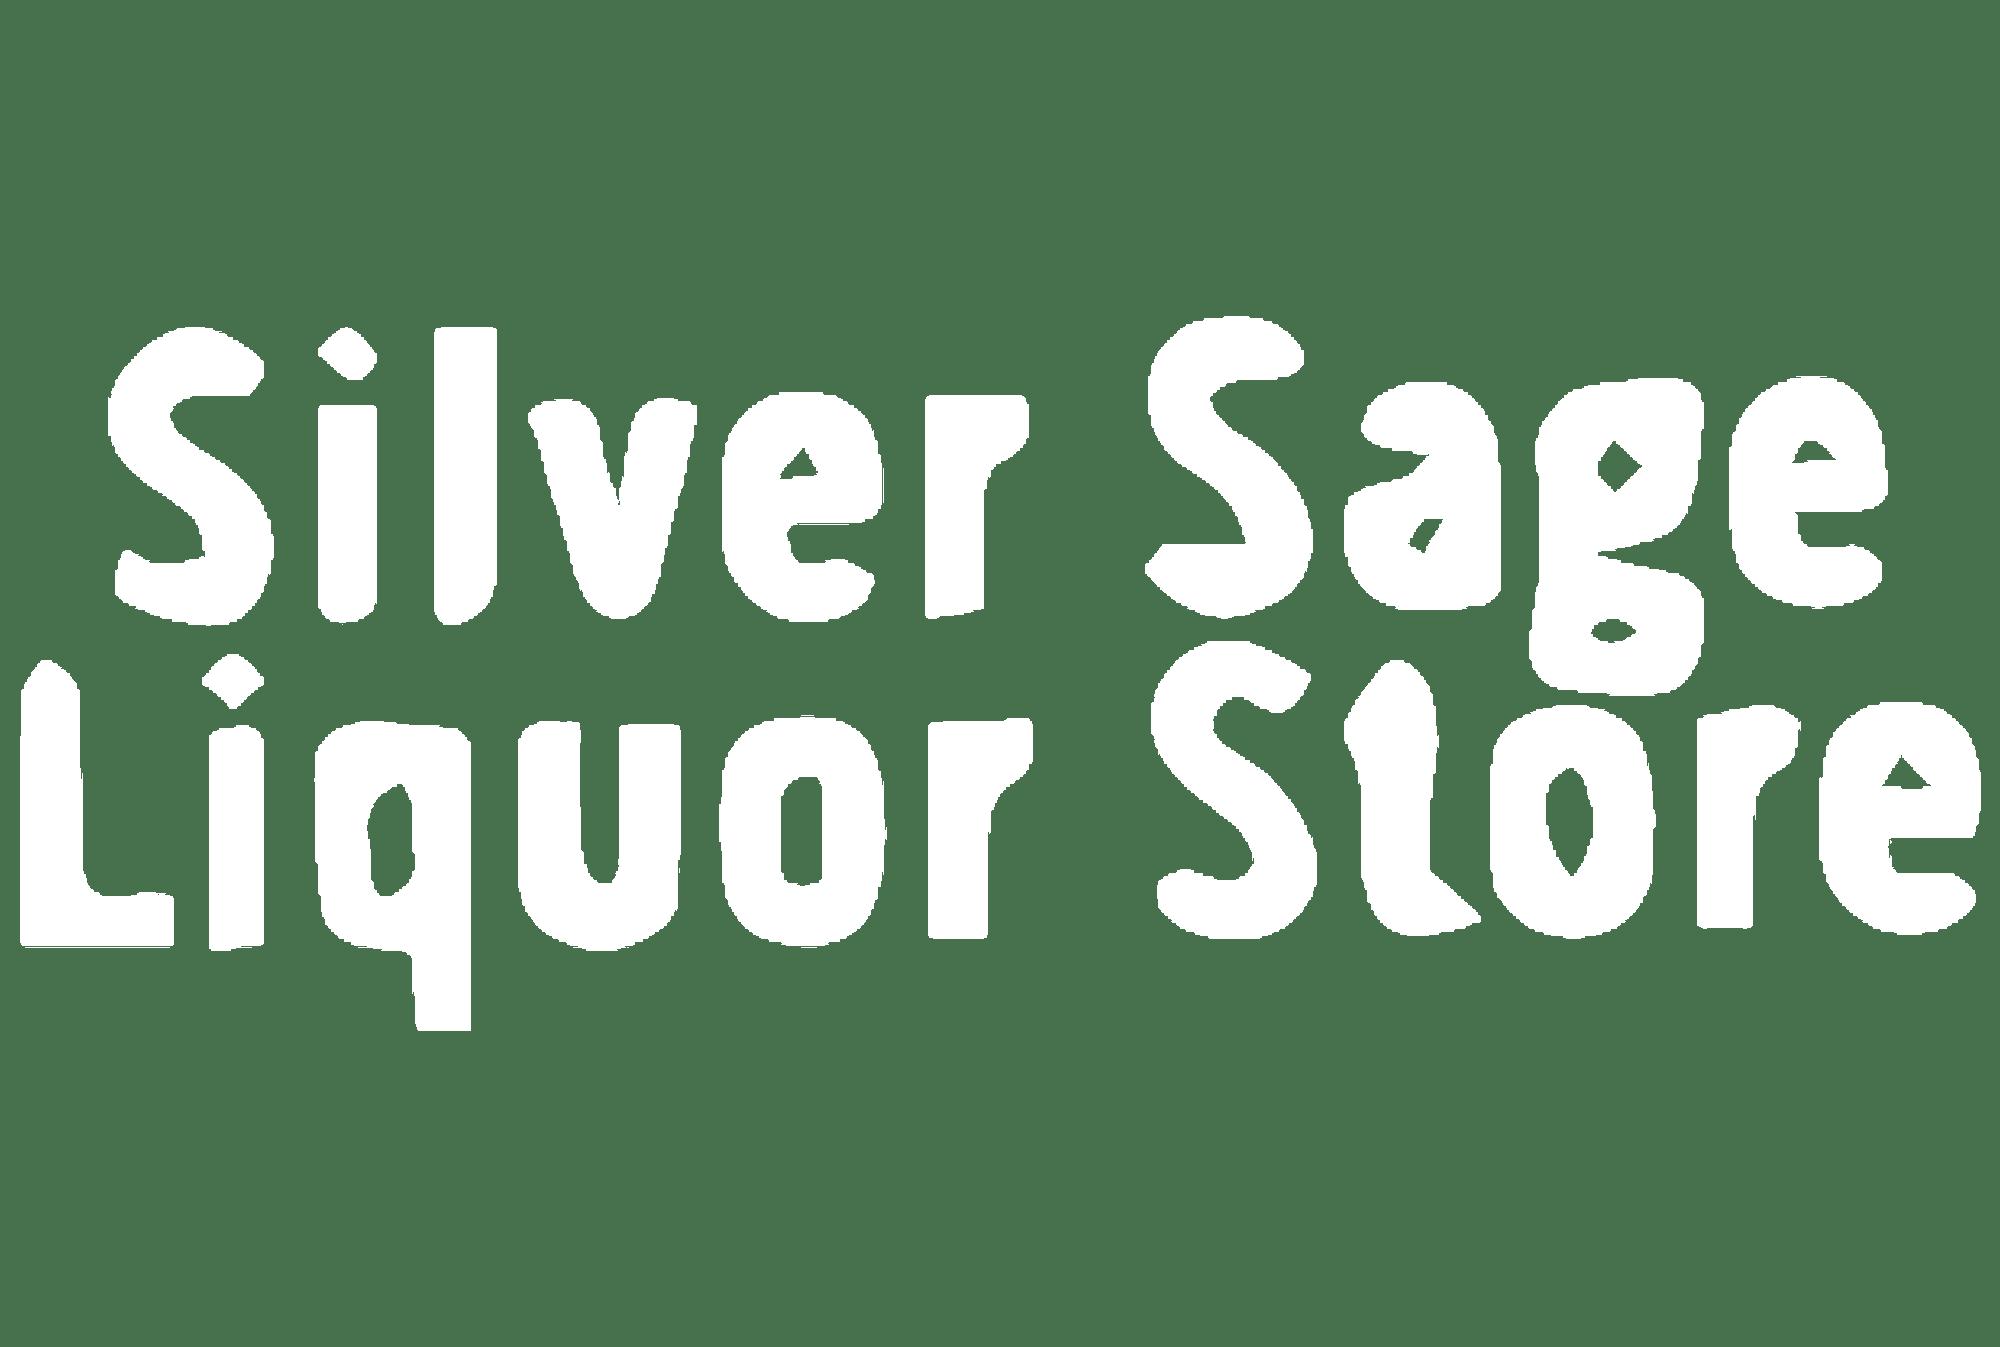 Silver Sage Liquor